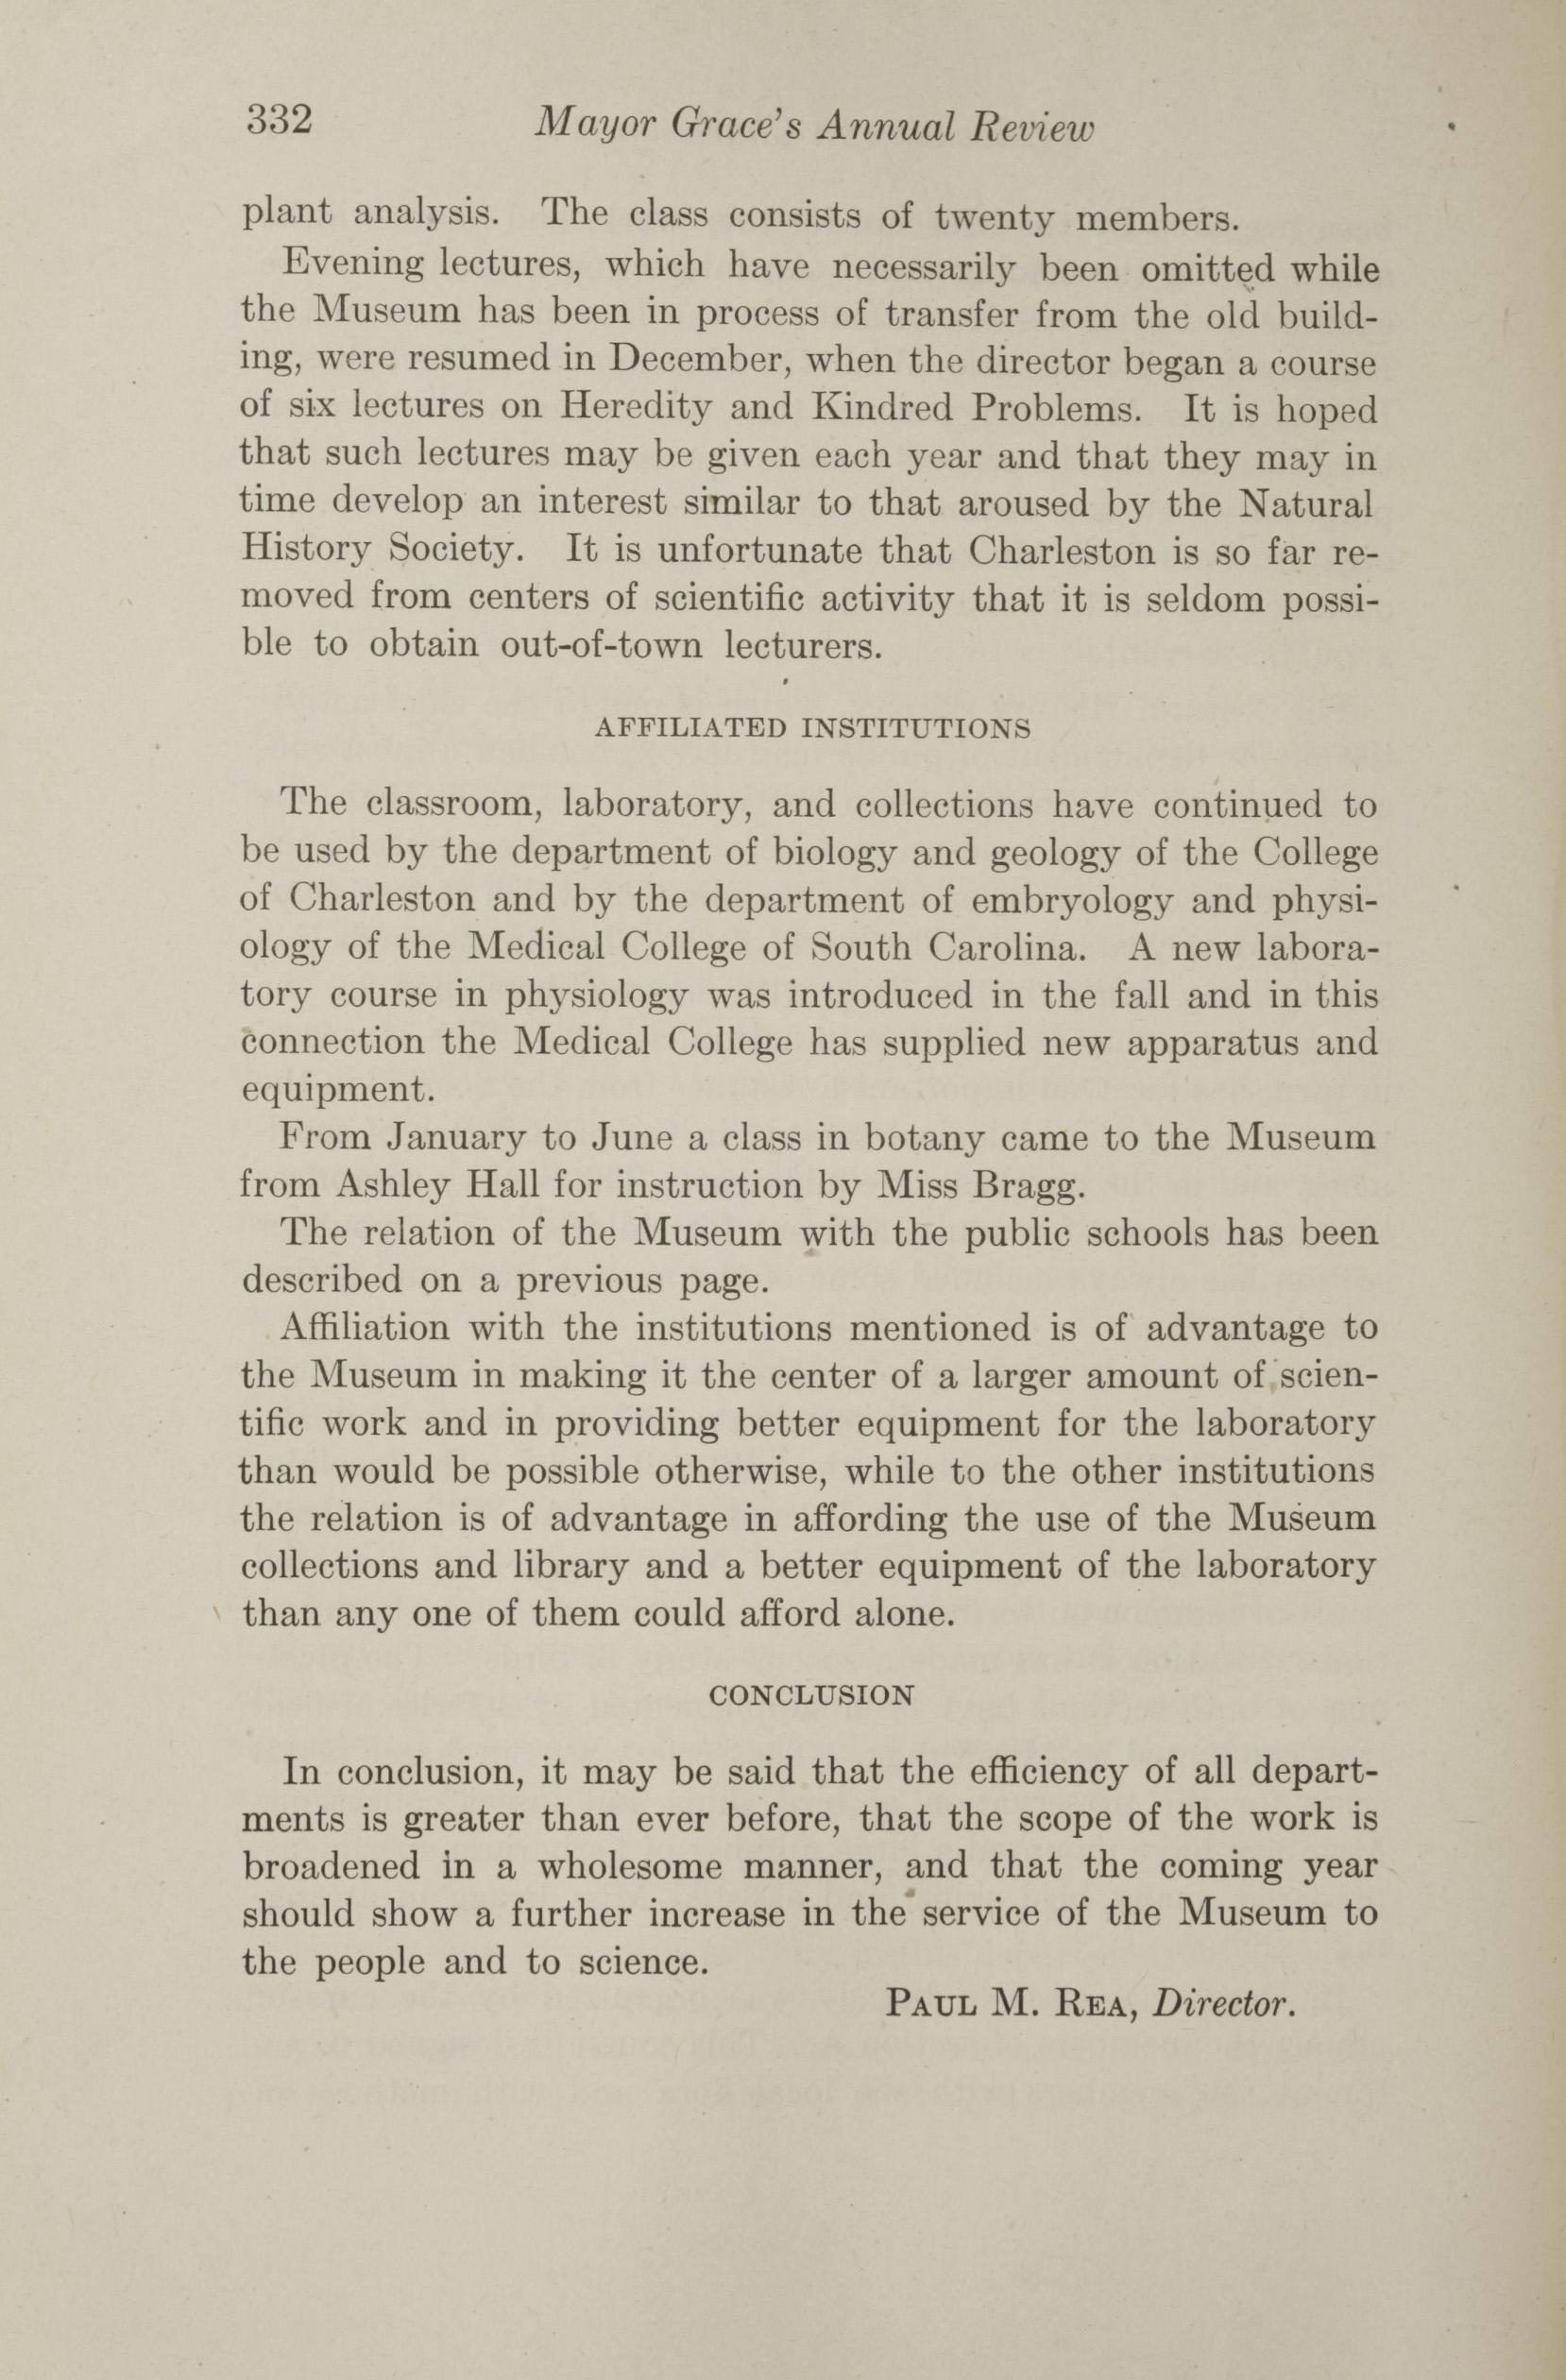 Charleston Yearbook, 1912, page 332